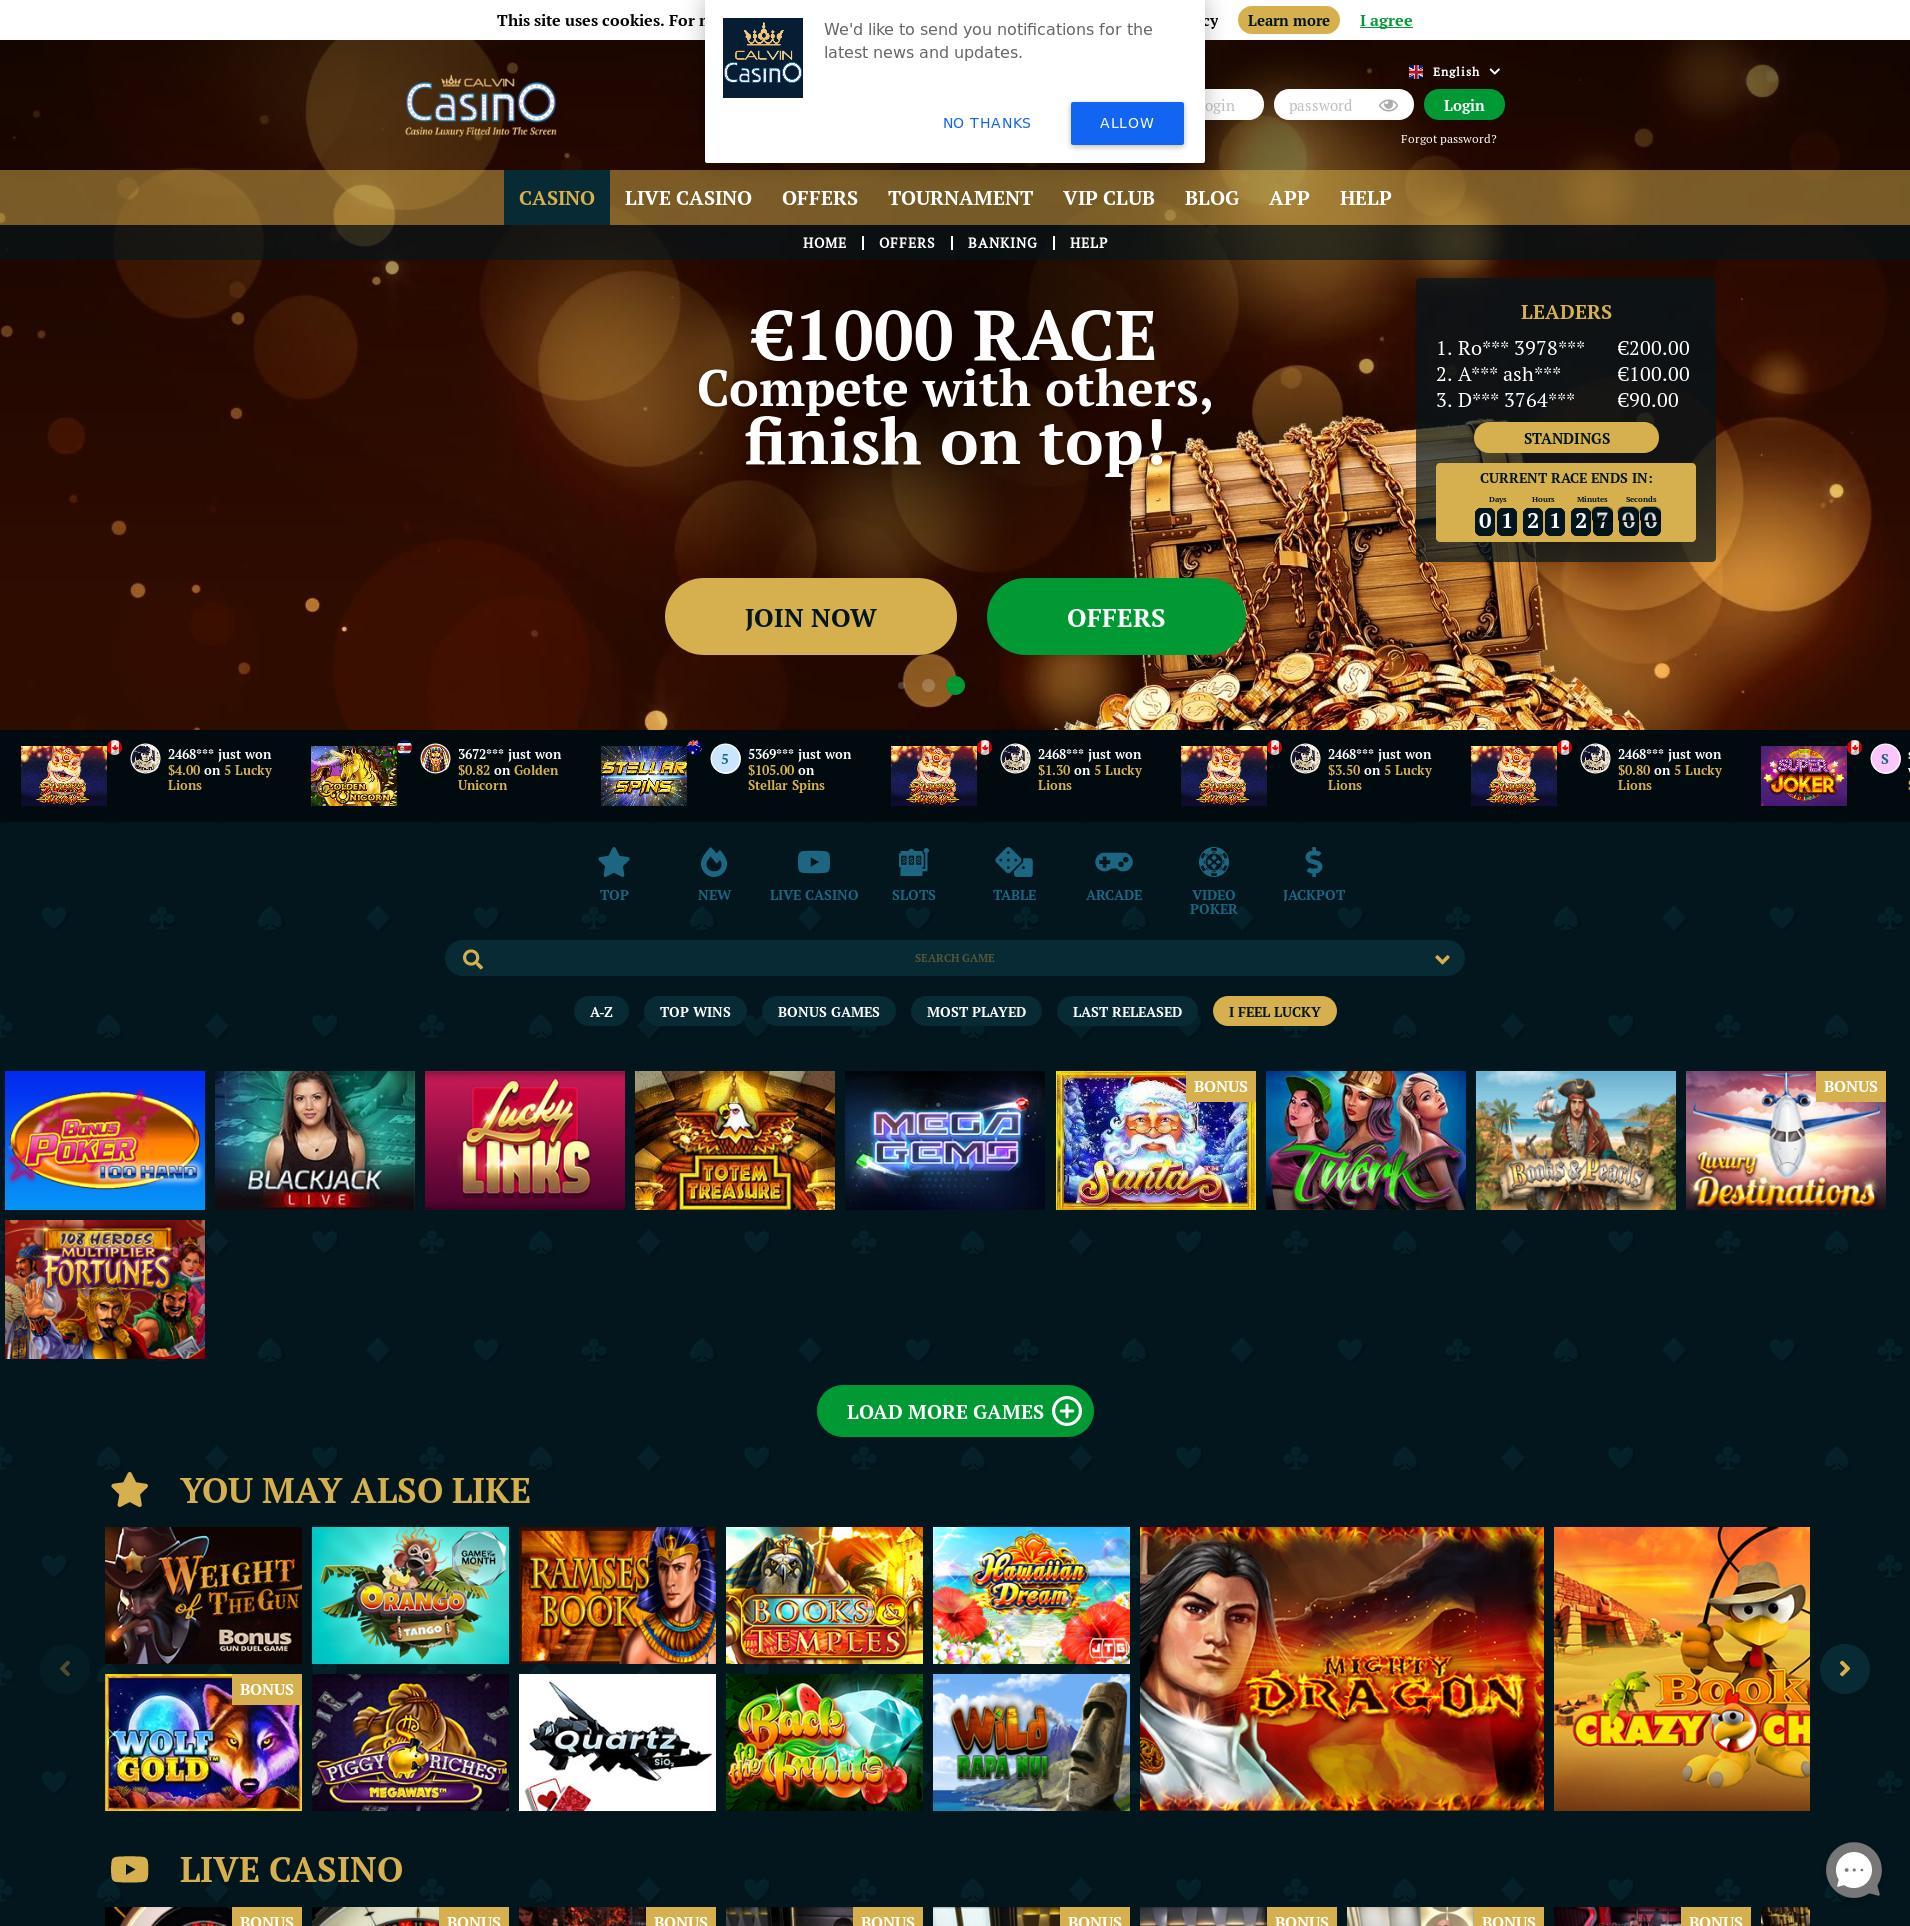 Casino screen Lobby 2020-06-02 for Germany